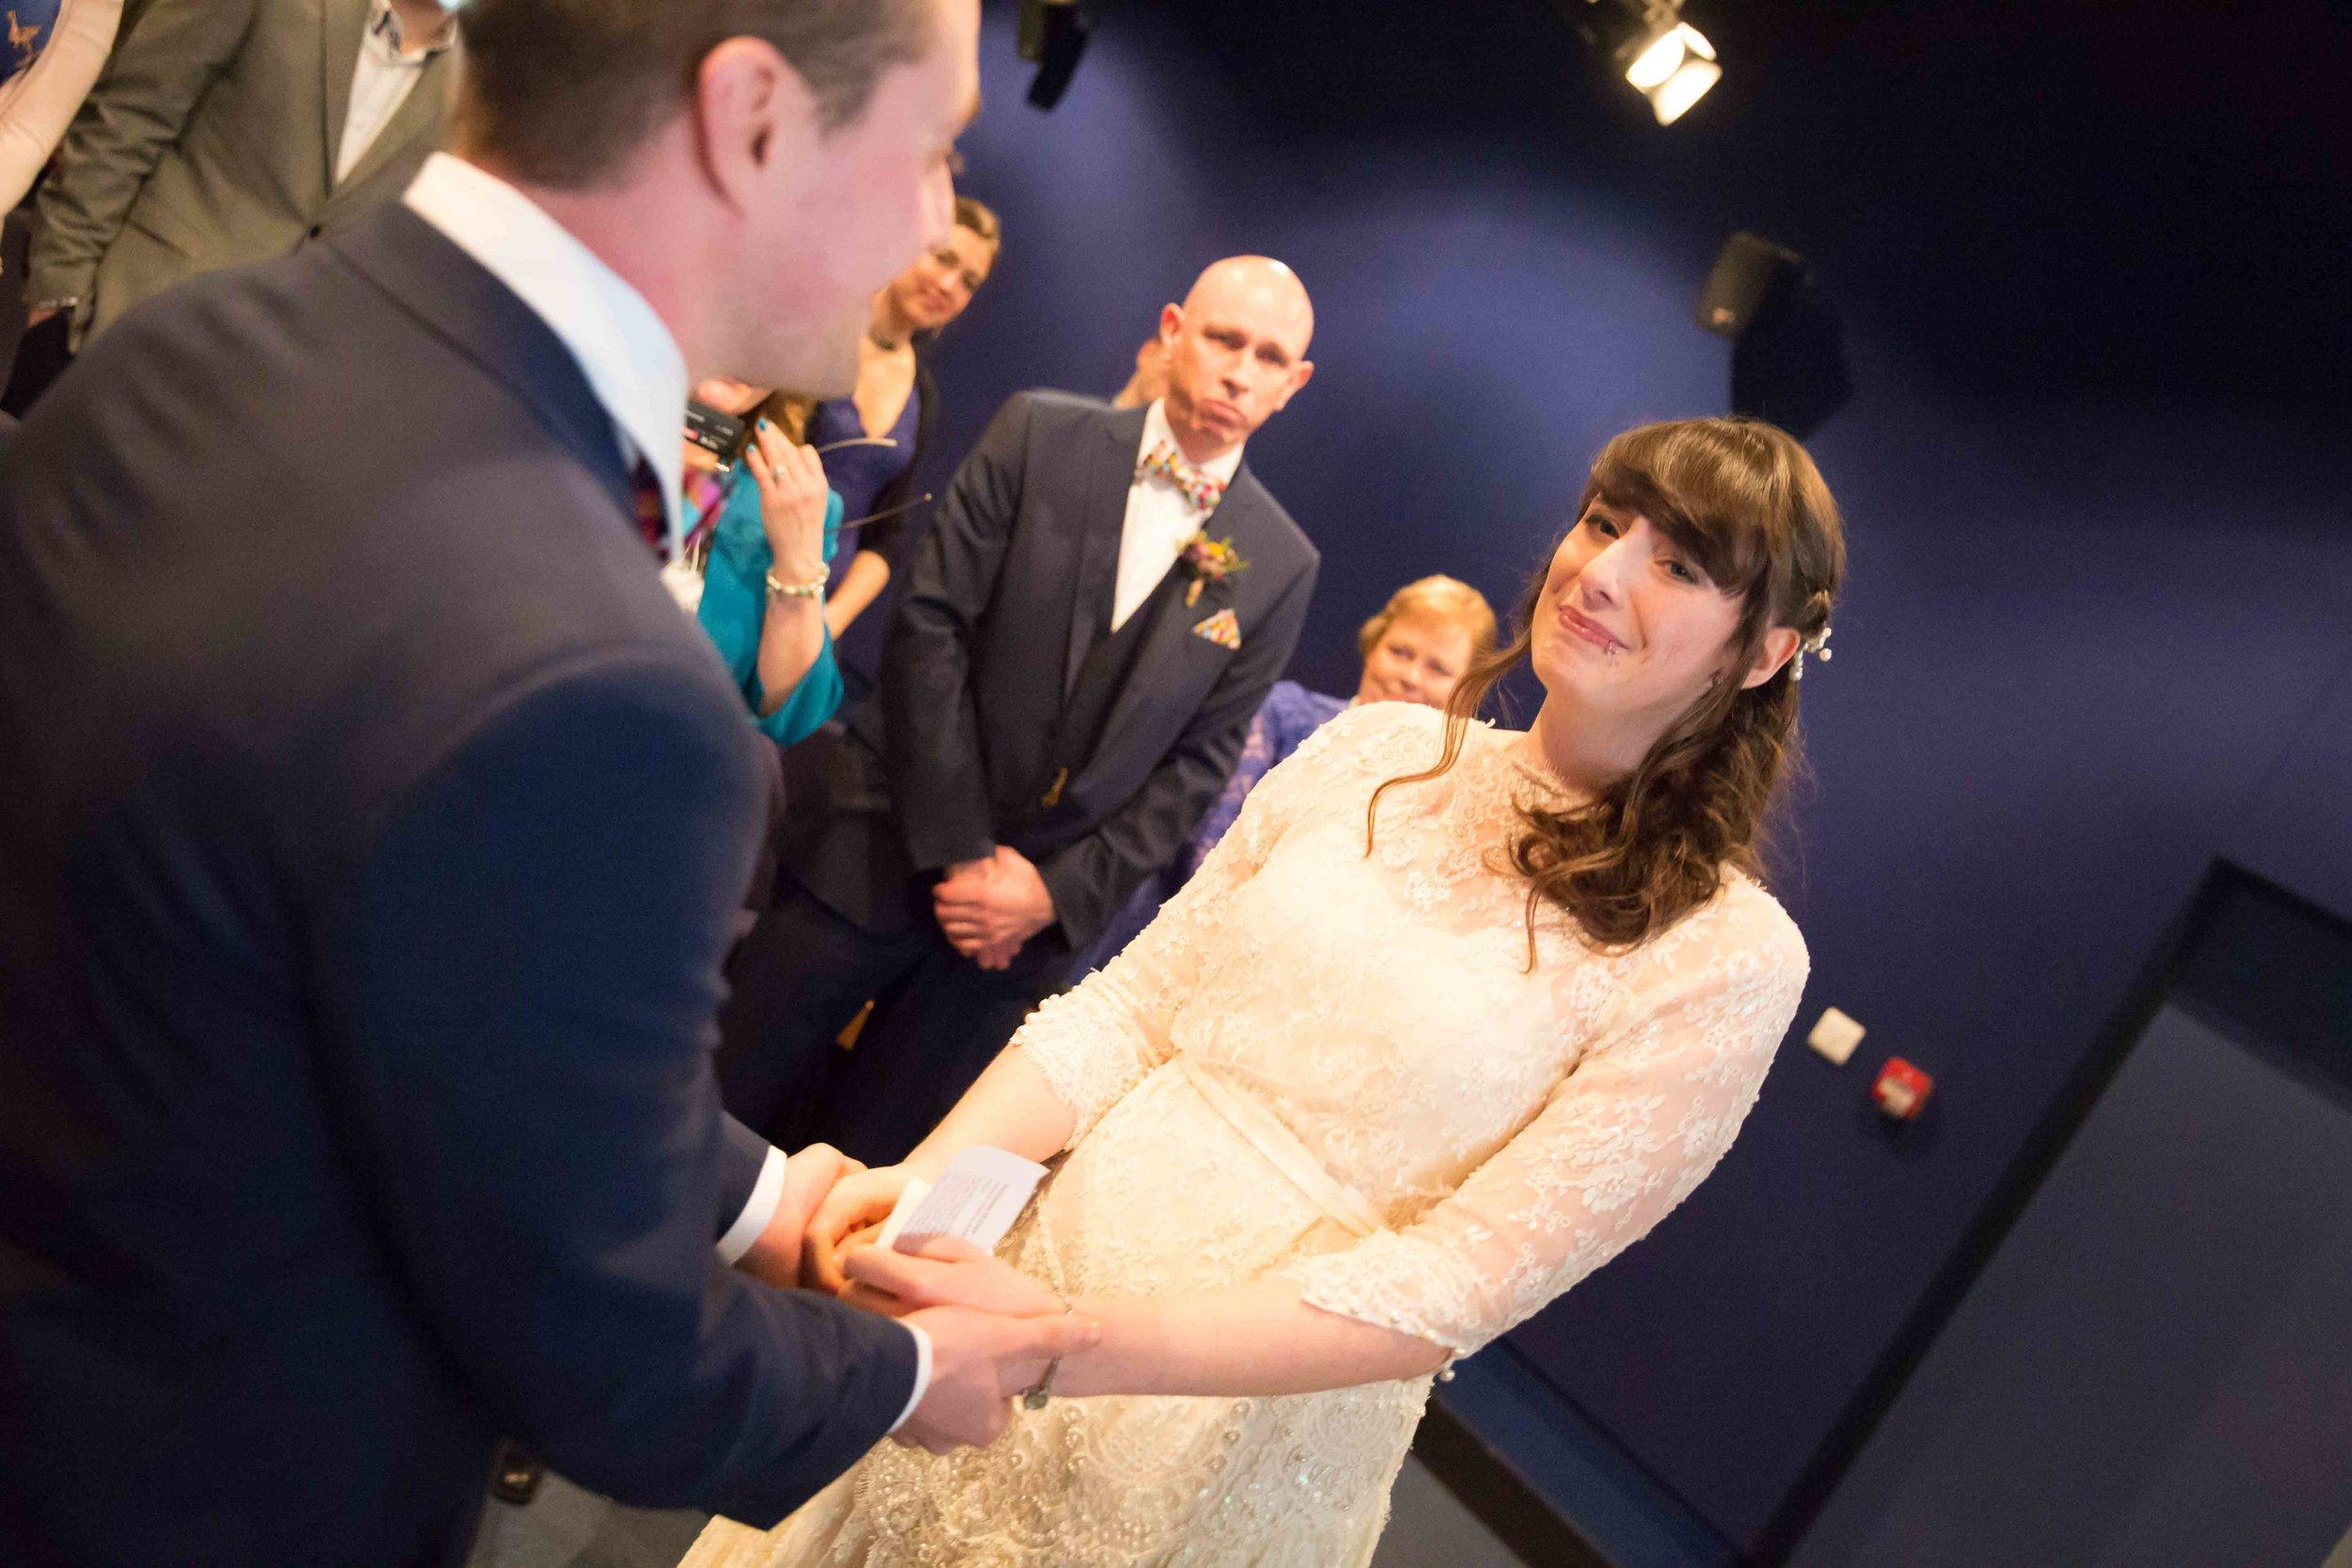 Adam & Faye - Wright Wedding Photography - Bristol Wedding Photographer -116.jpg